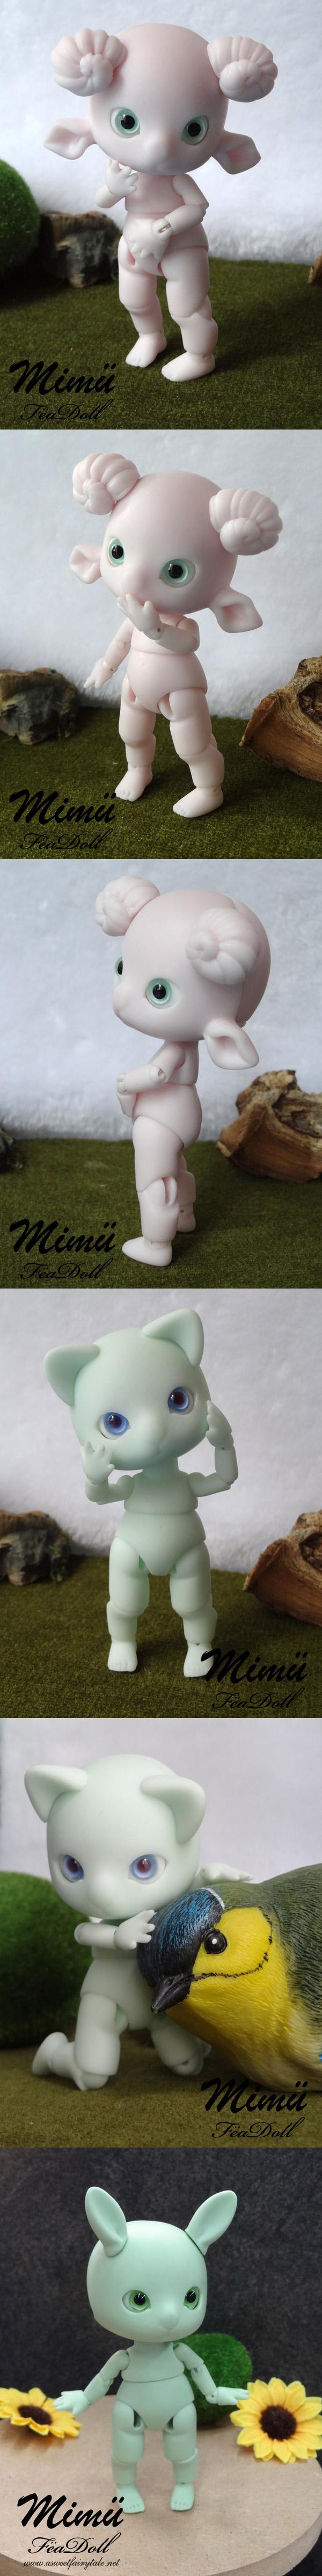 Mimü Bélier, Chat, Lapin